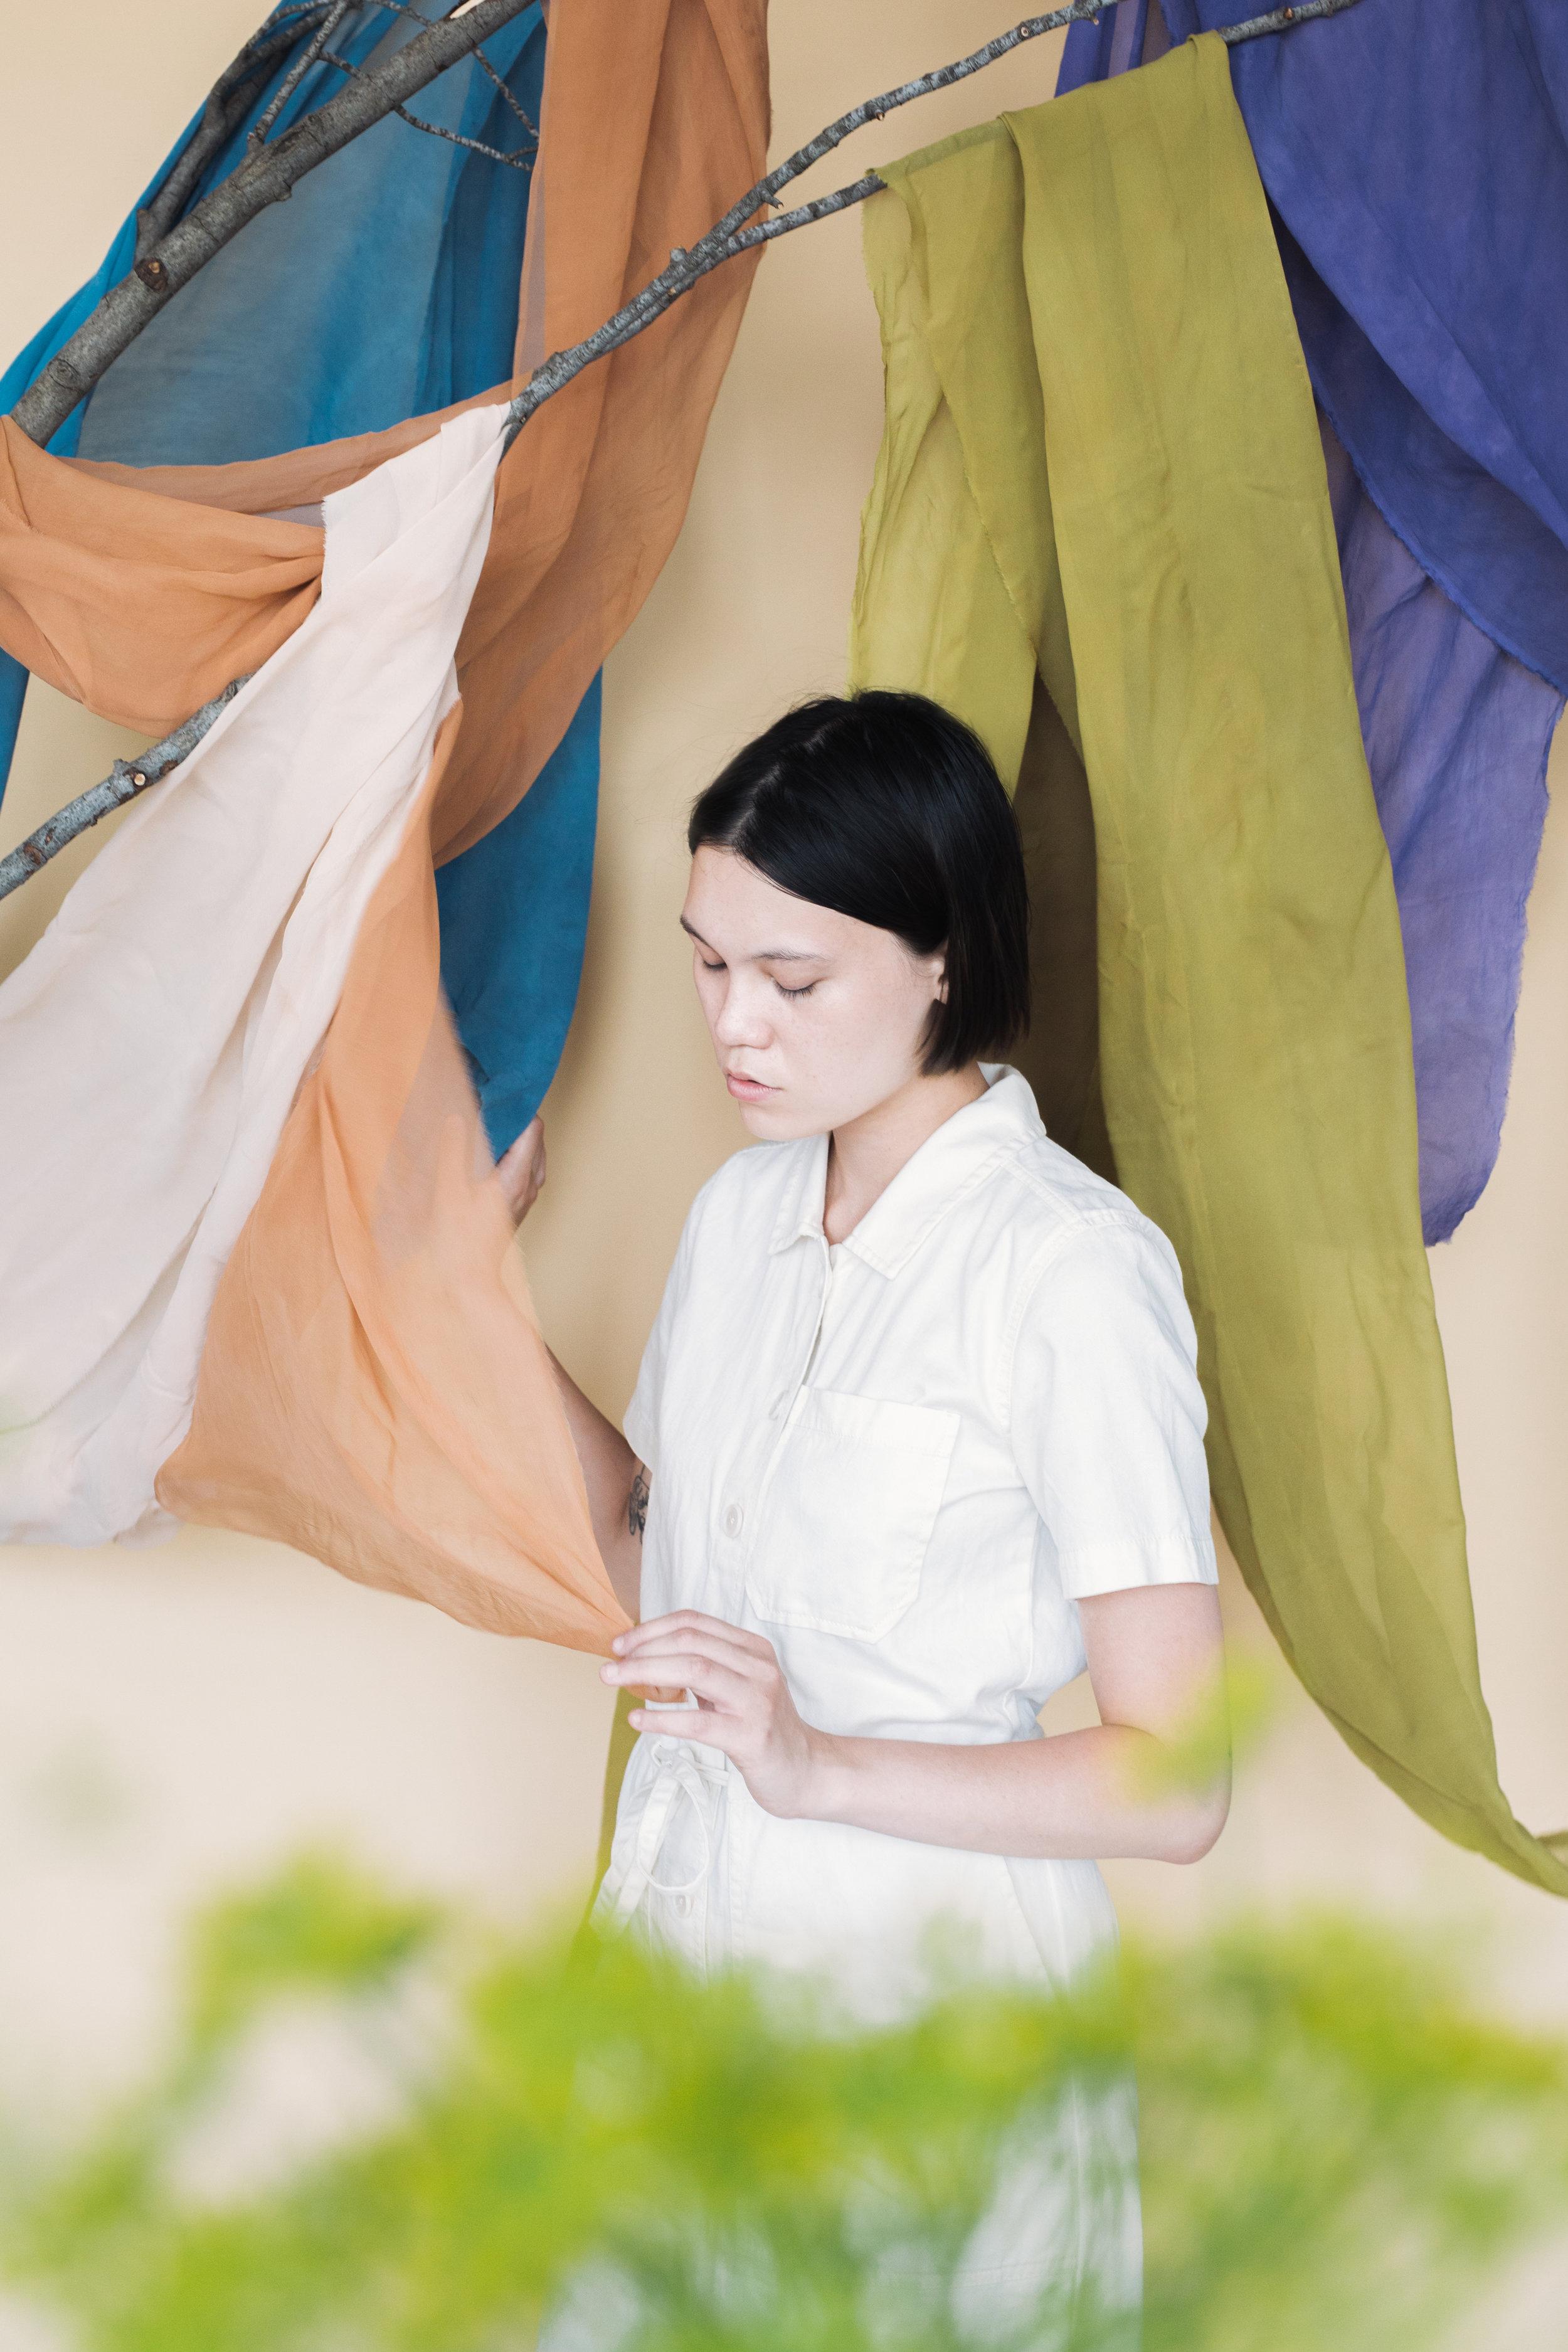 rosemarine-textiles-anastasia-cheatham.jpg